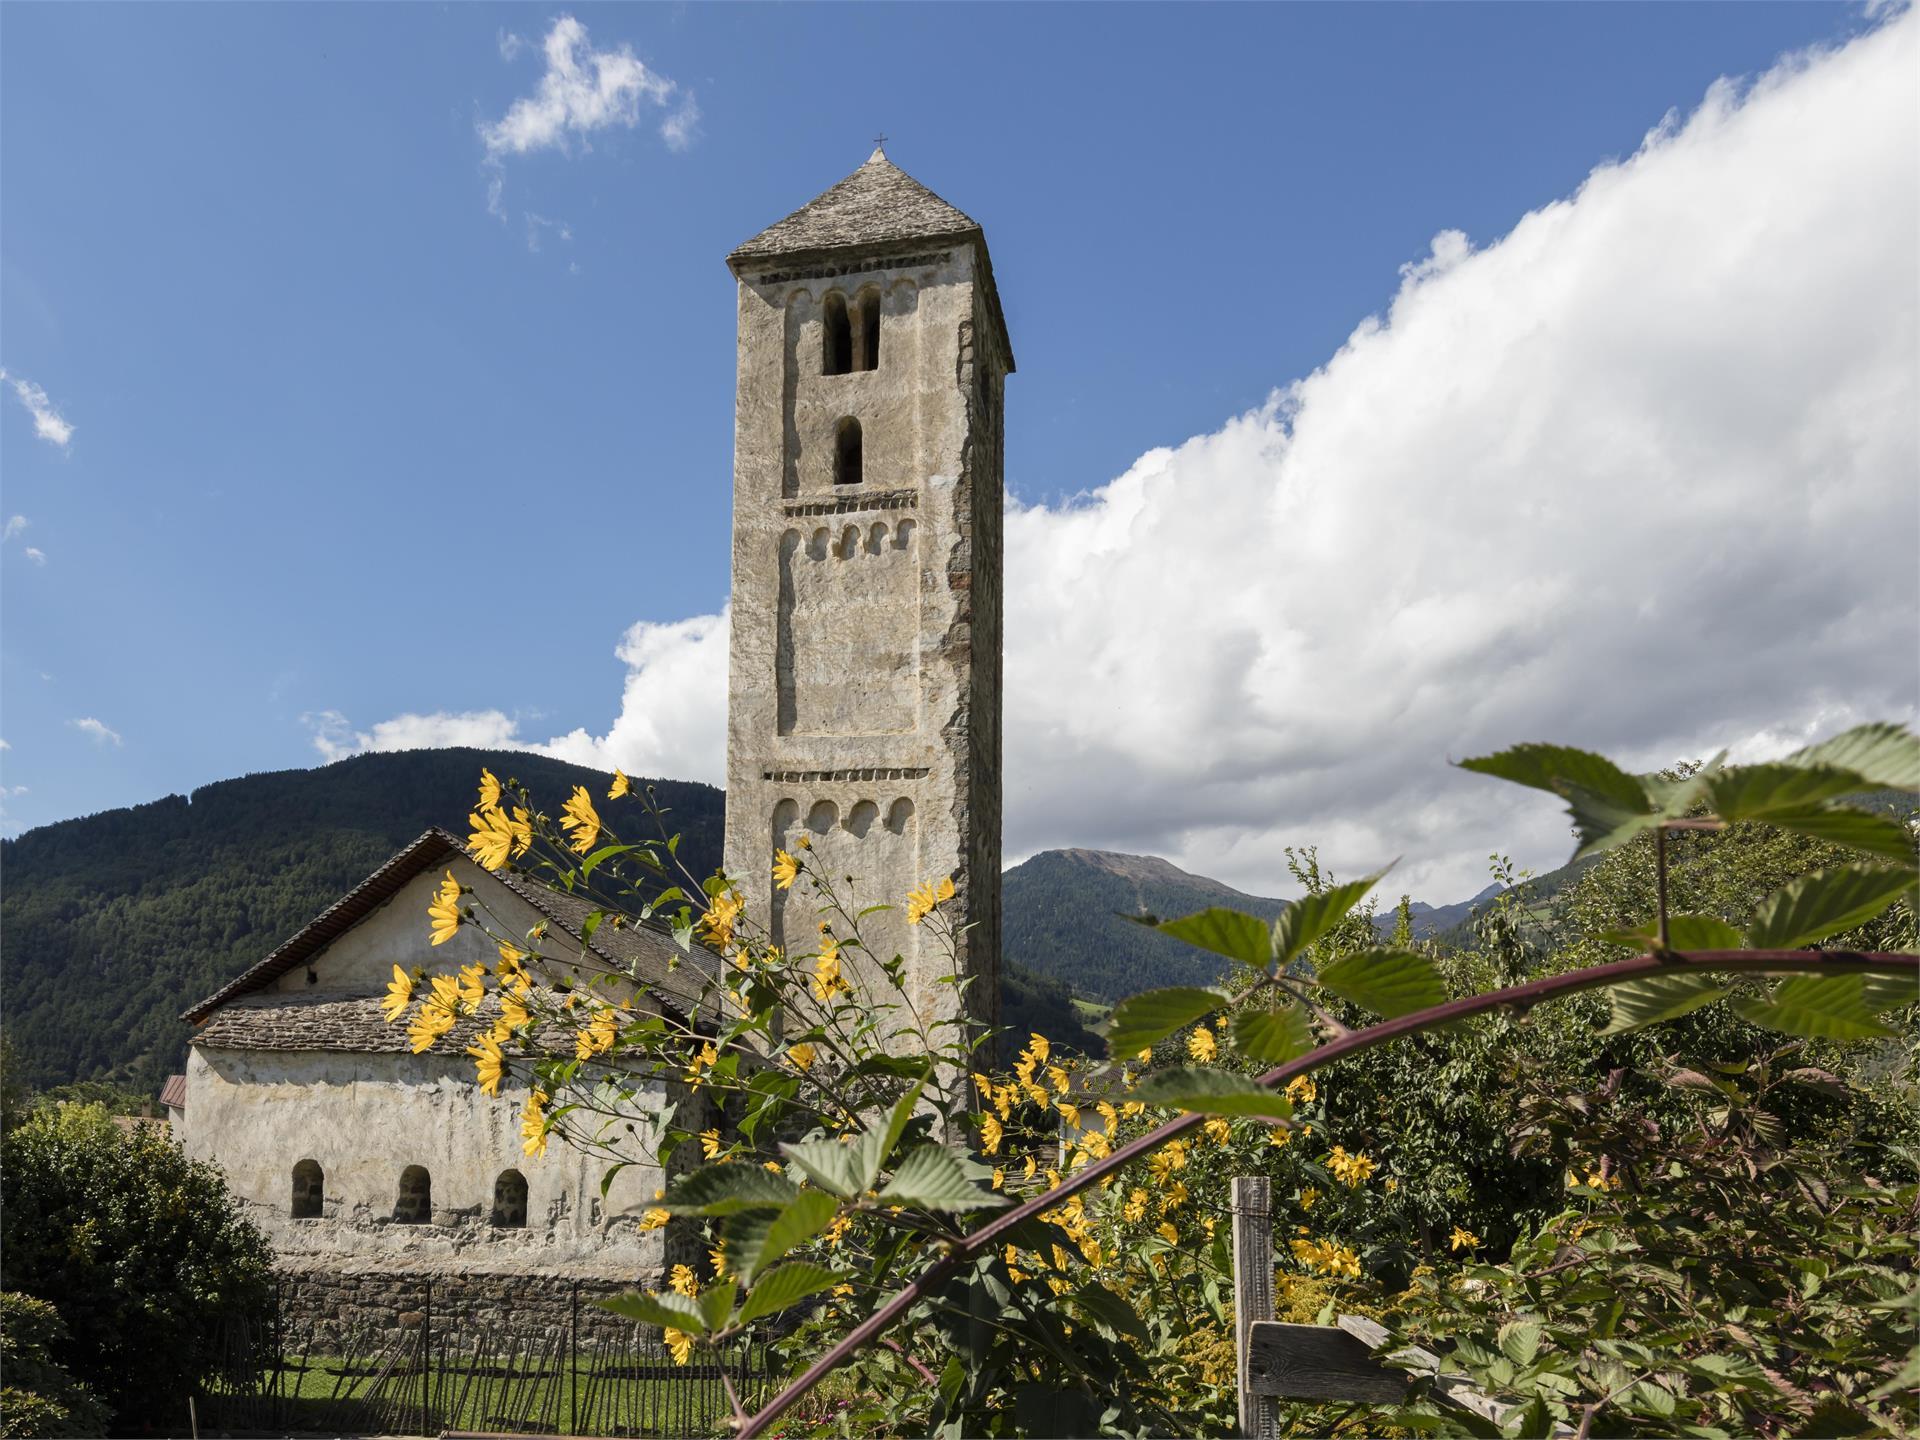 St. Benedikt Kirche